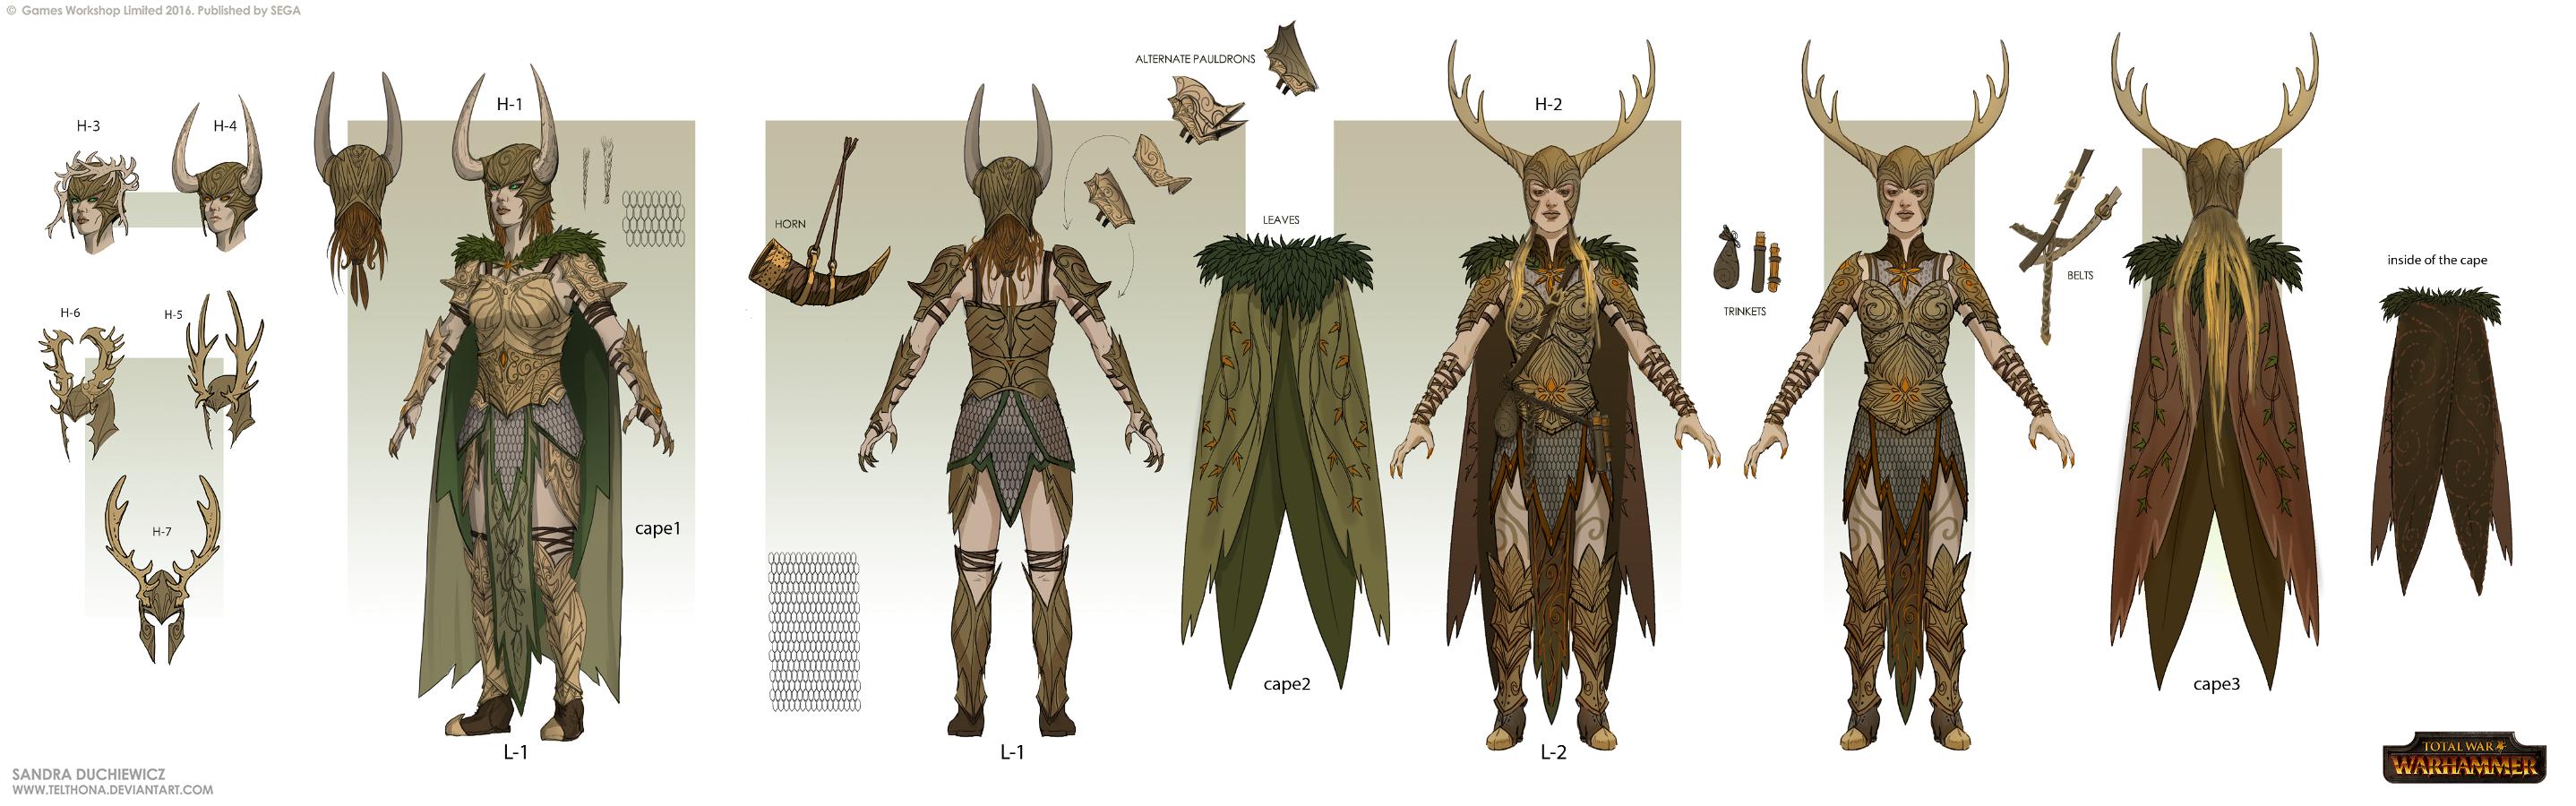 Total War: Warhammer Concept Art - Gladelords